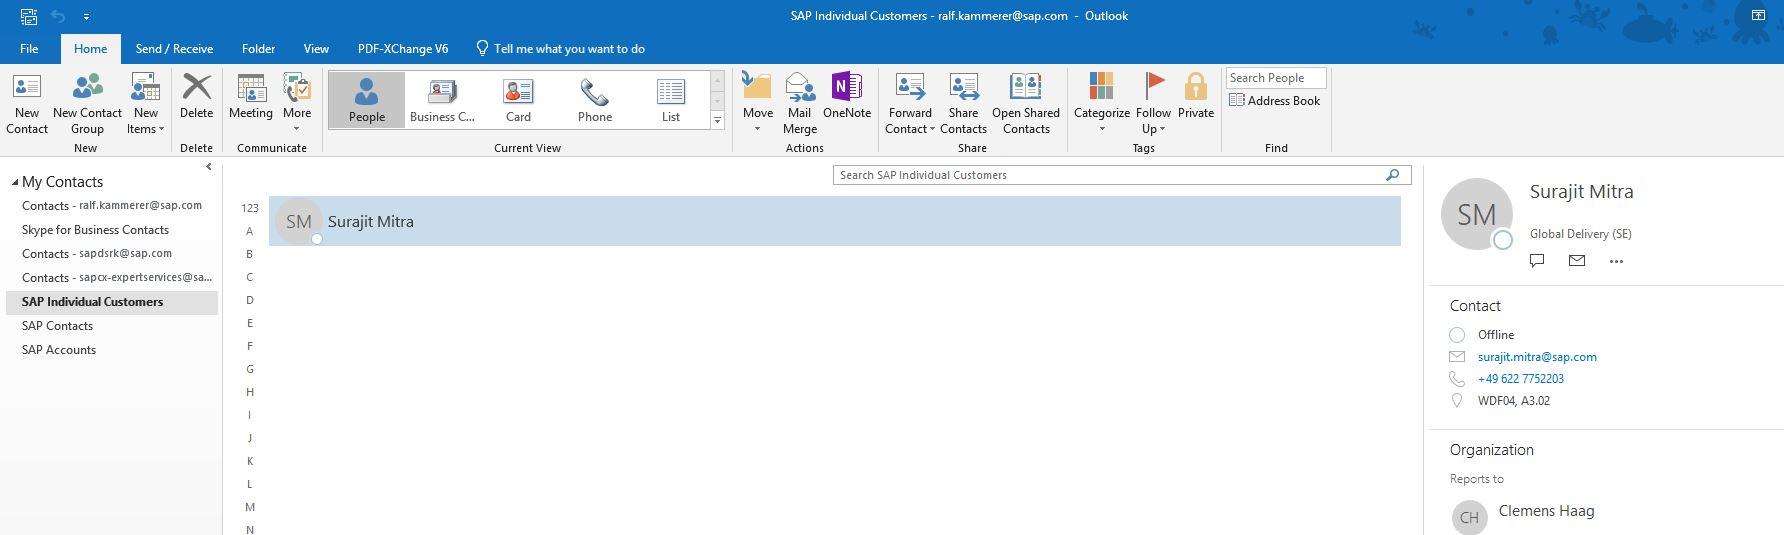 C4C Server side Integration with Microsoft Outlook | SAP Blogs